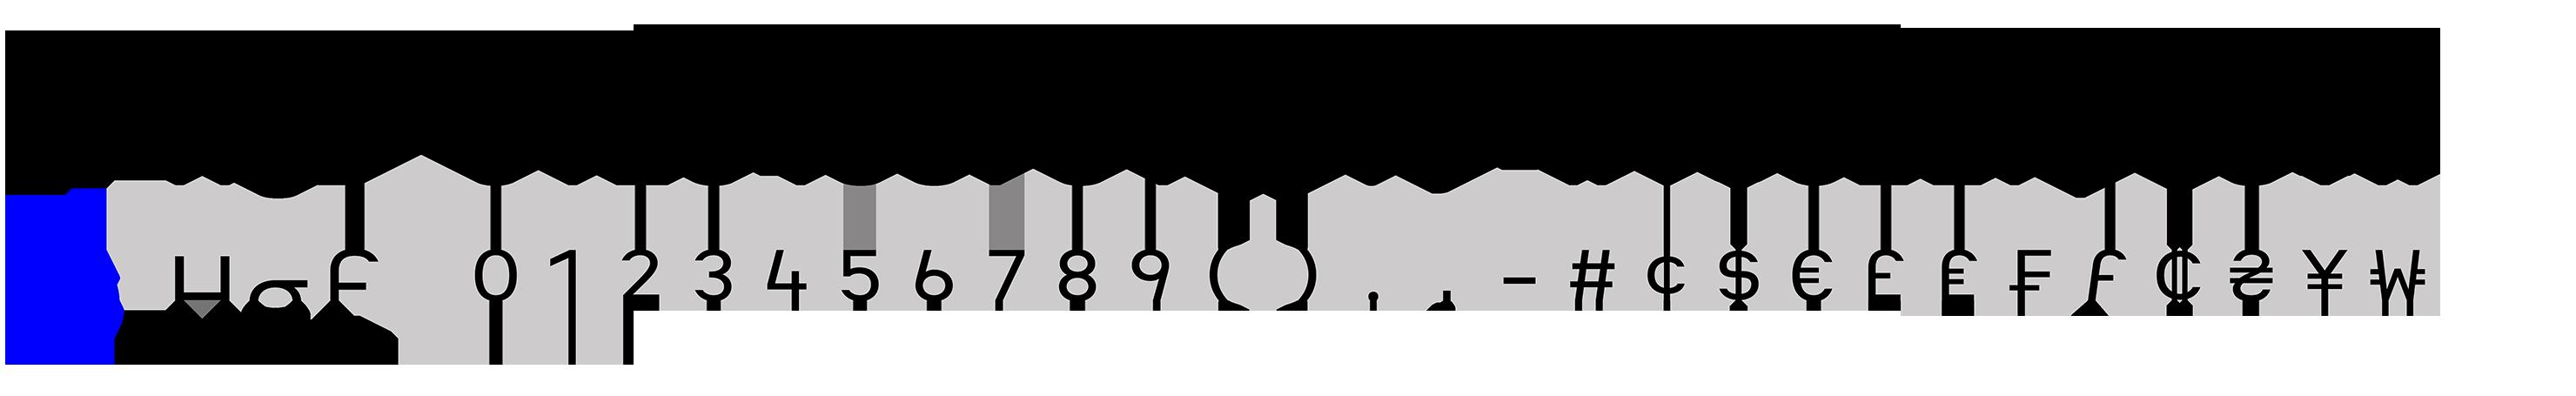 Typeface-Heimat-Mono-F11-Atlas-Font-Foundry